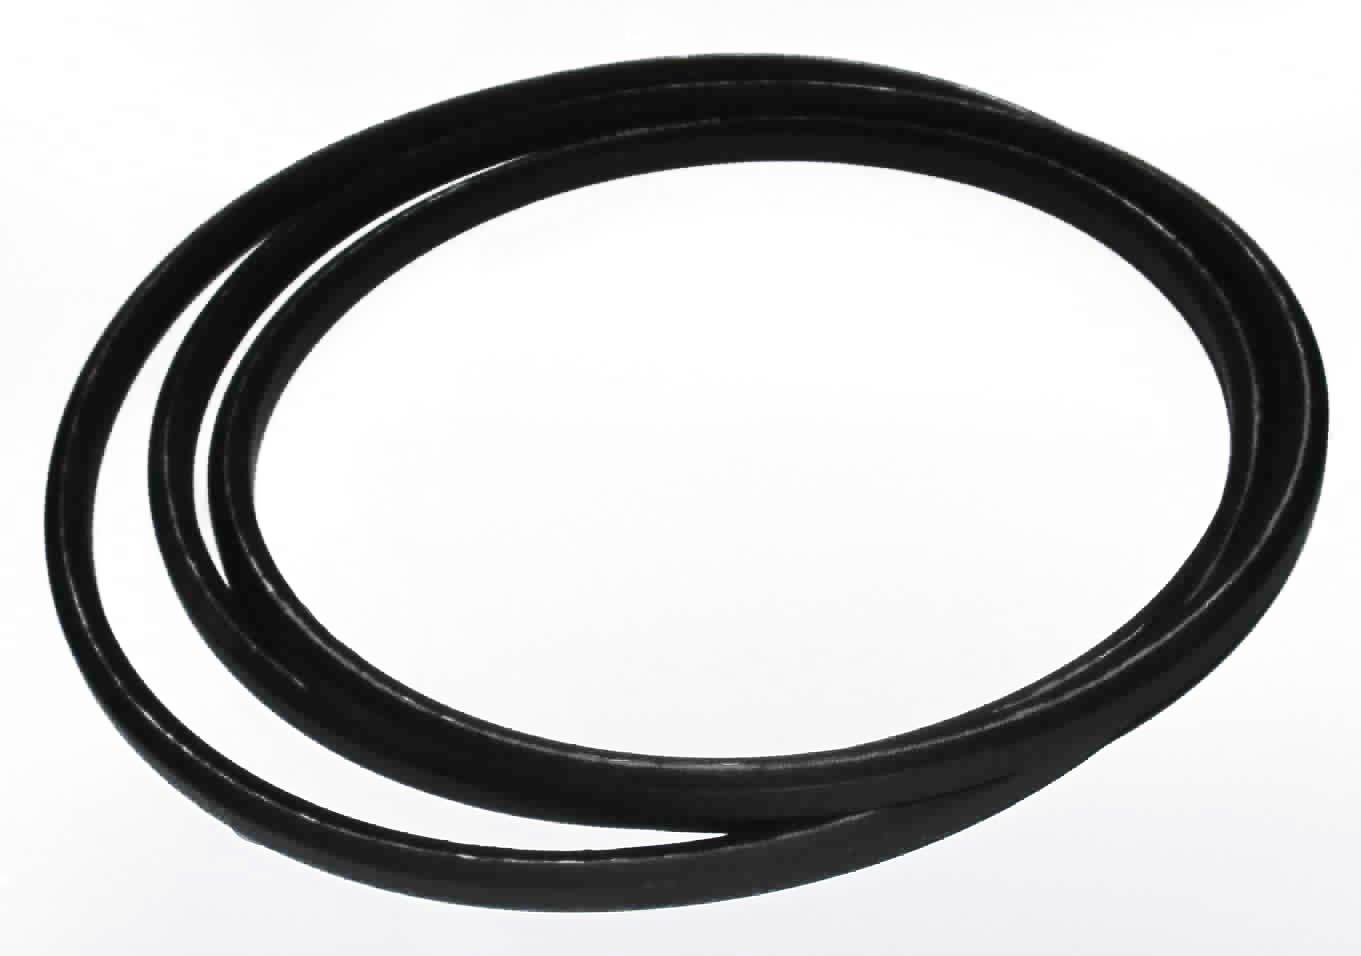 Westwood Genuine 22869800 AA105 36-inch Deck Drive Belt